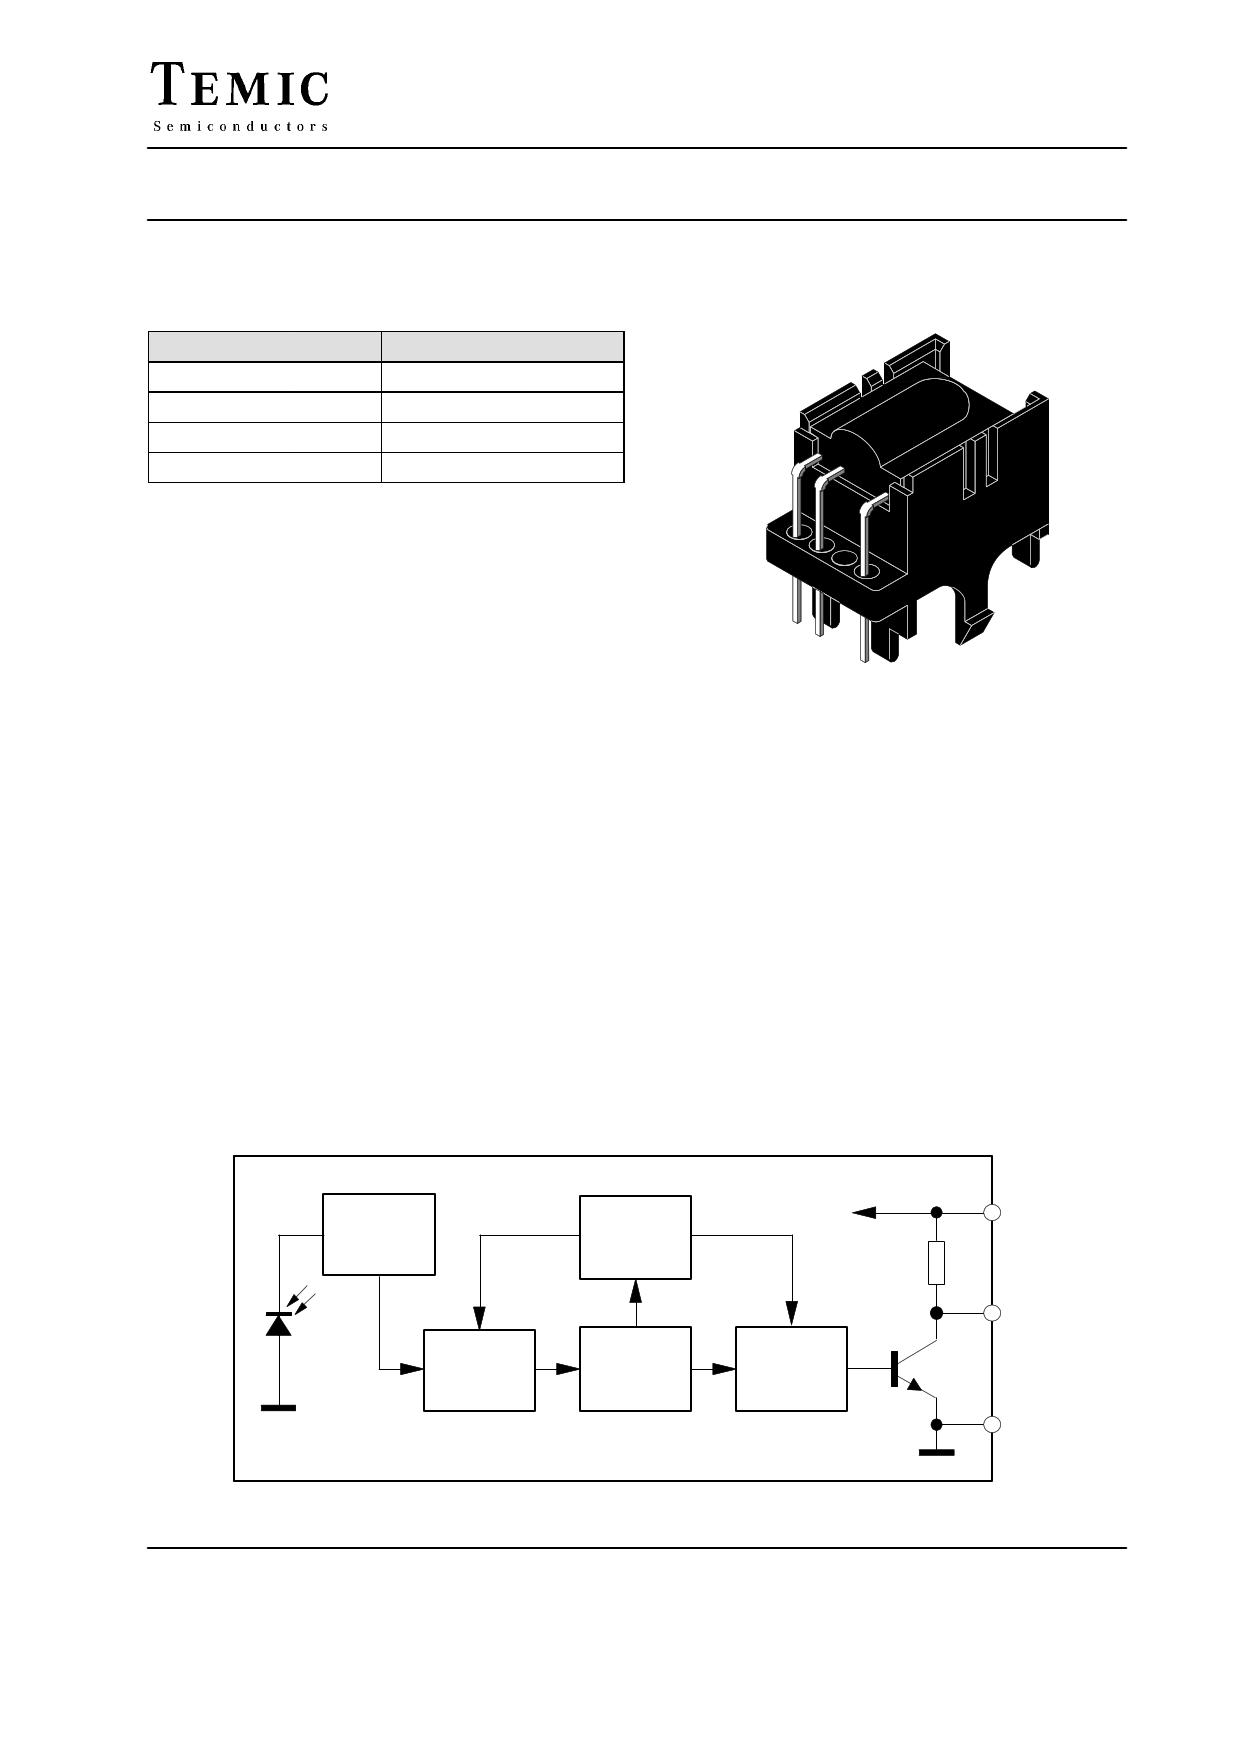 TFMT5380 데이터시트 및 TFMT5380 PDF